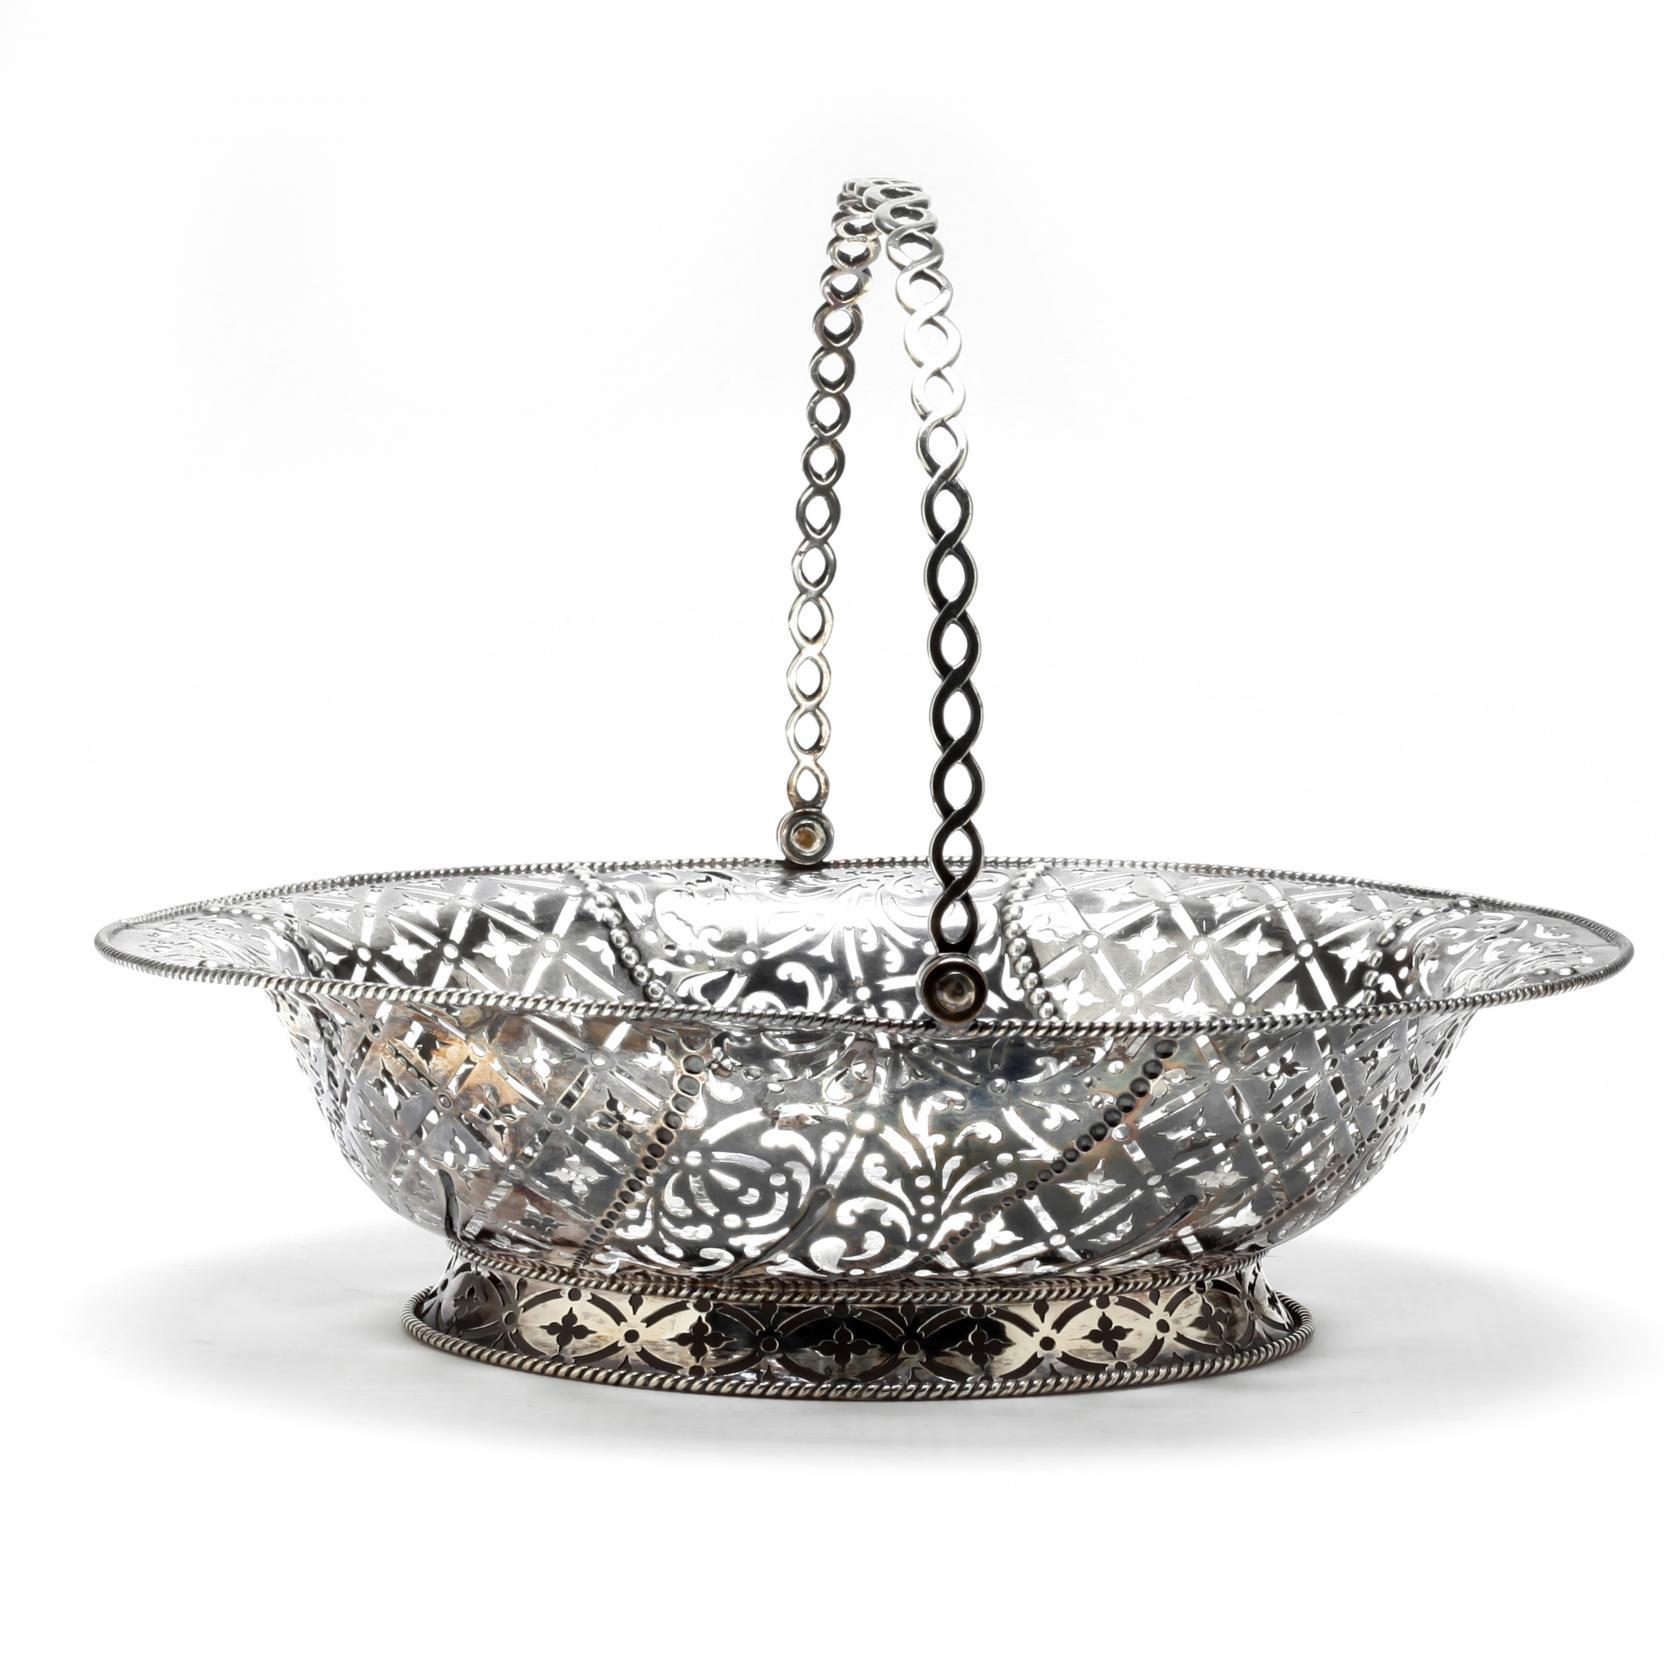 a-george-iii-silver-cake-basket